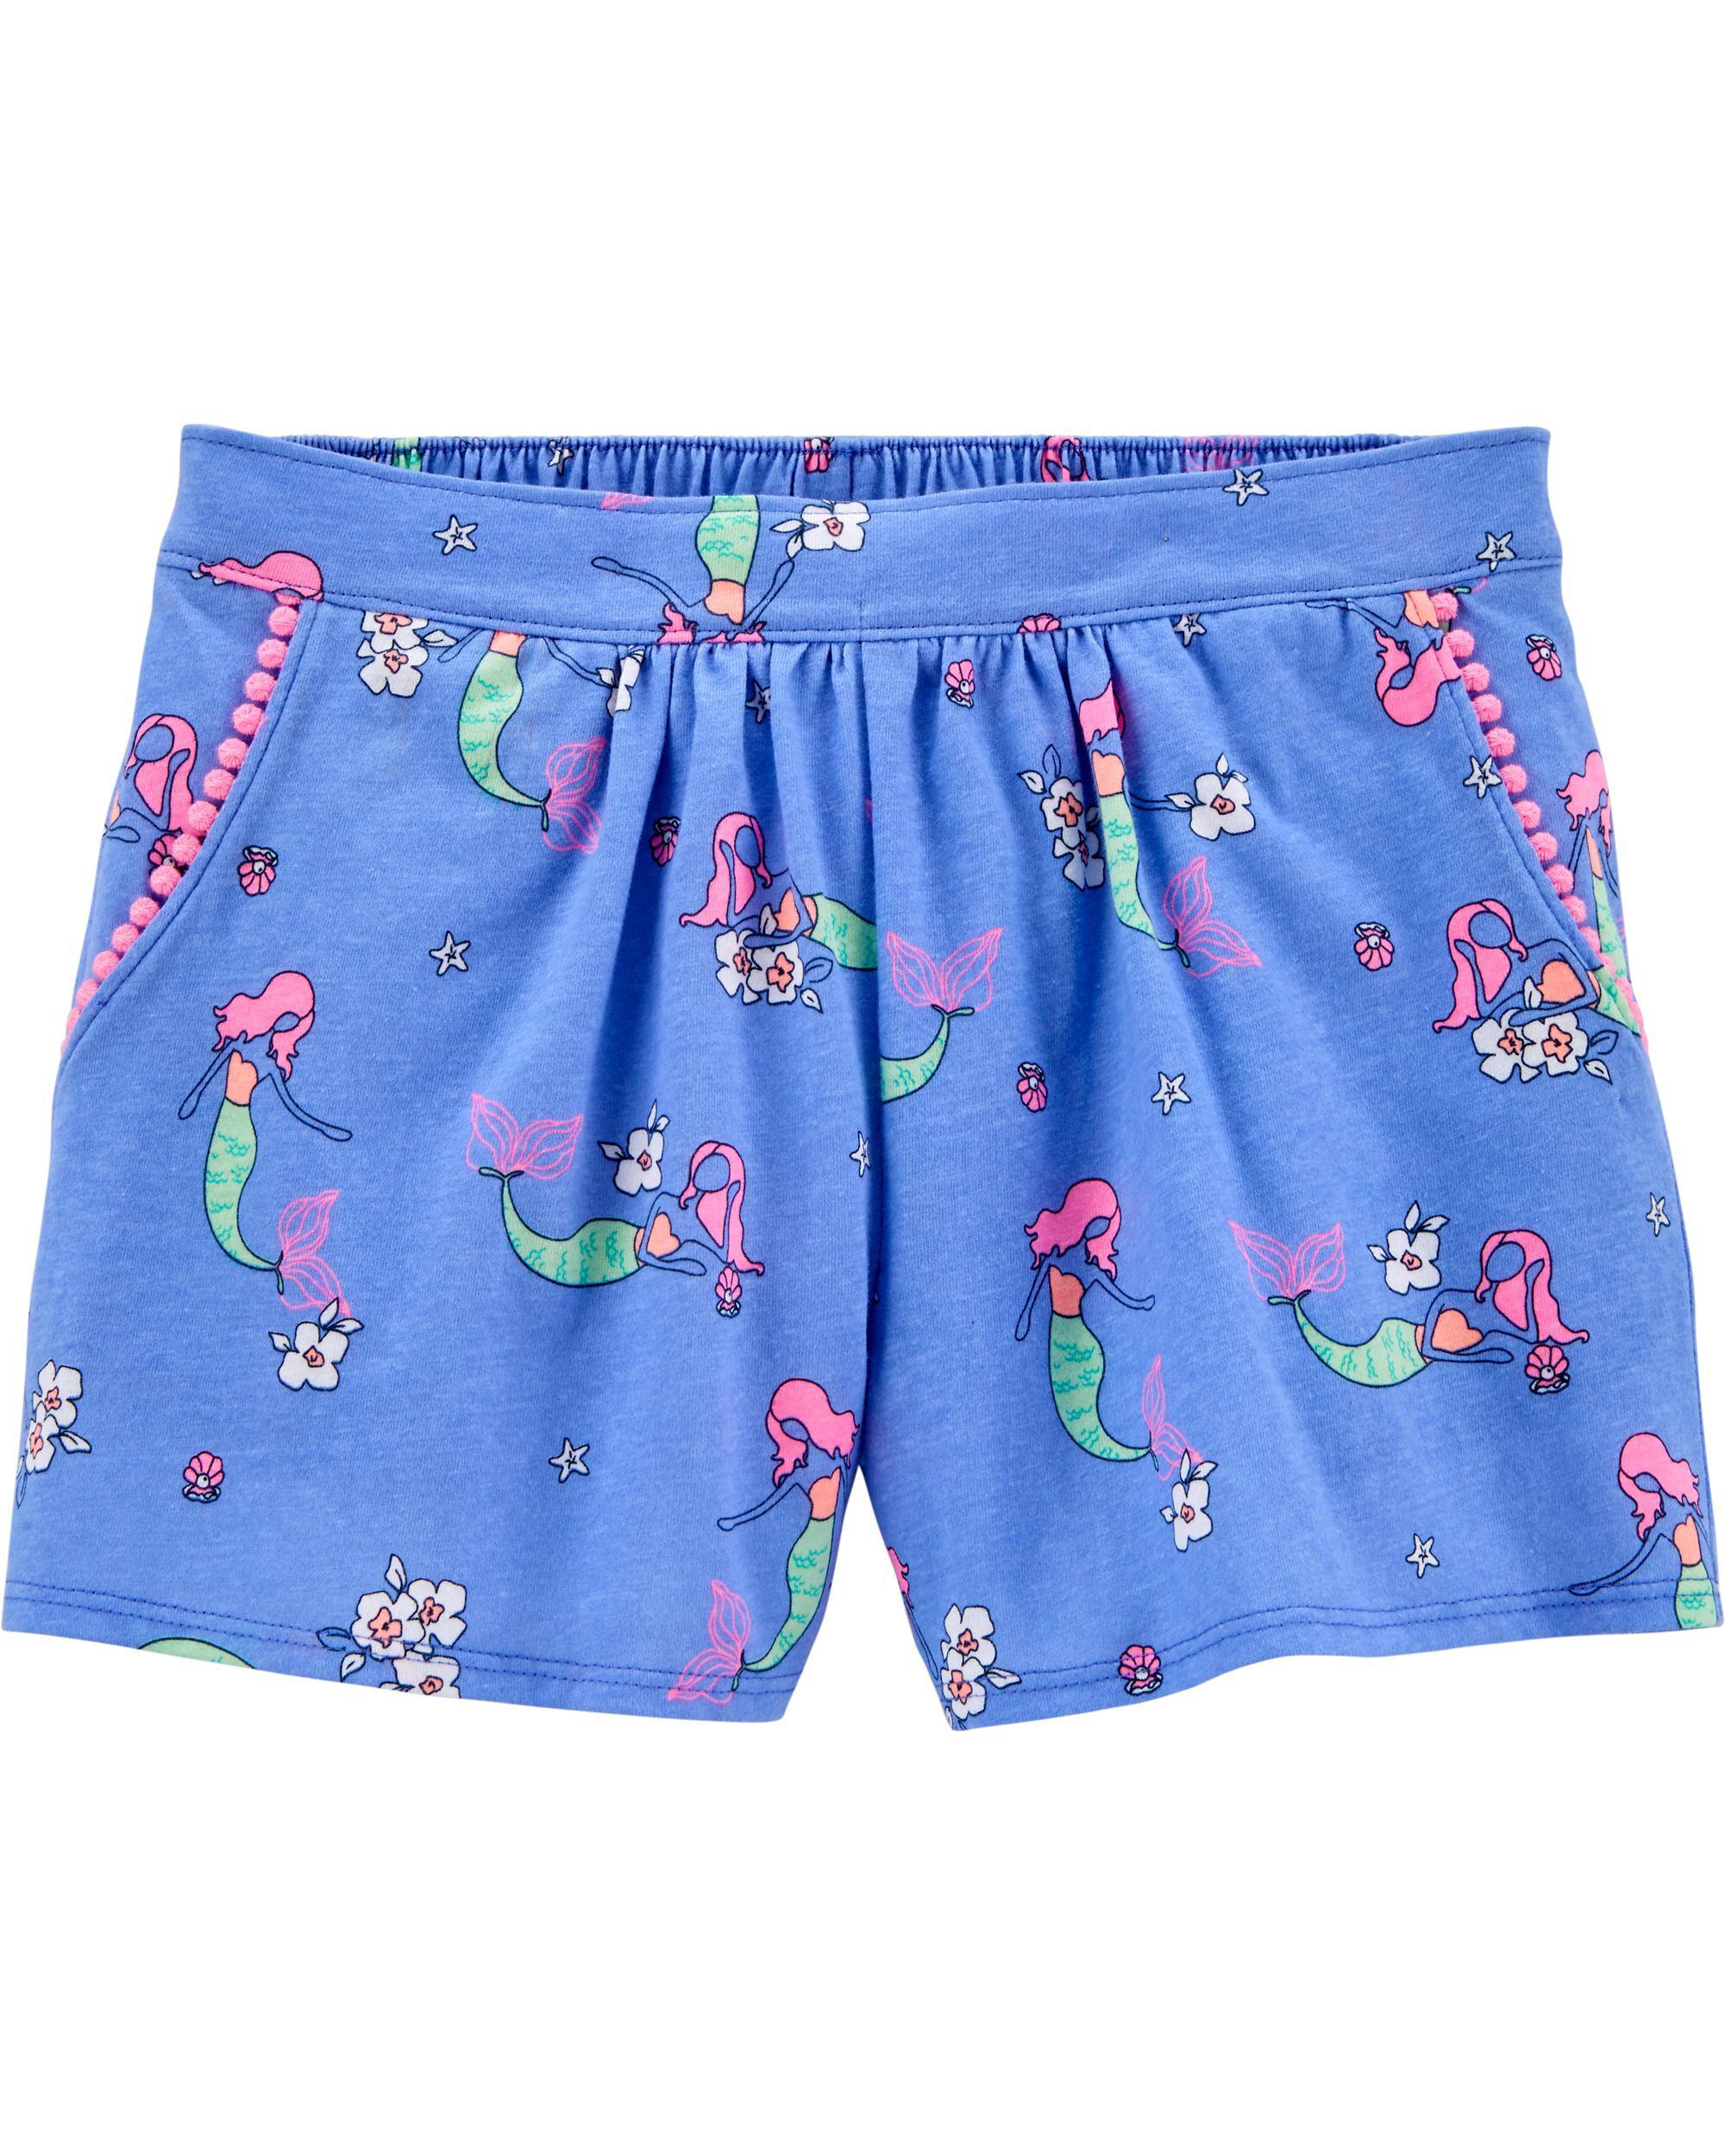 *CLEARANCE* Mermaid Pom Pom Shorts